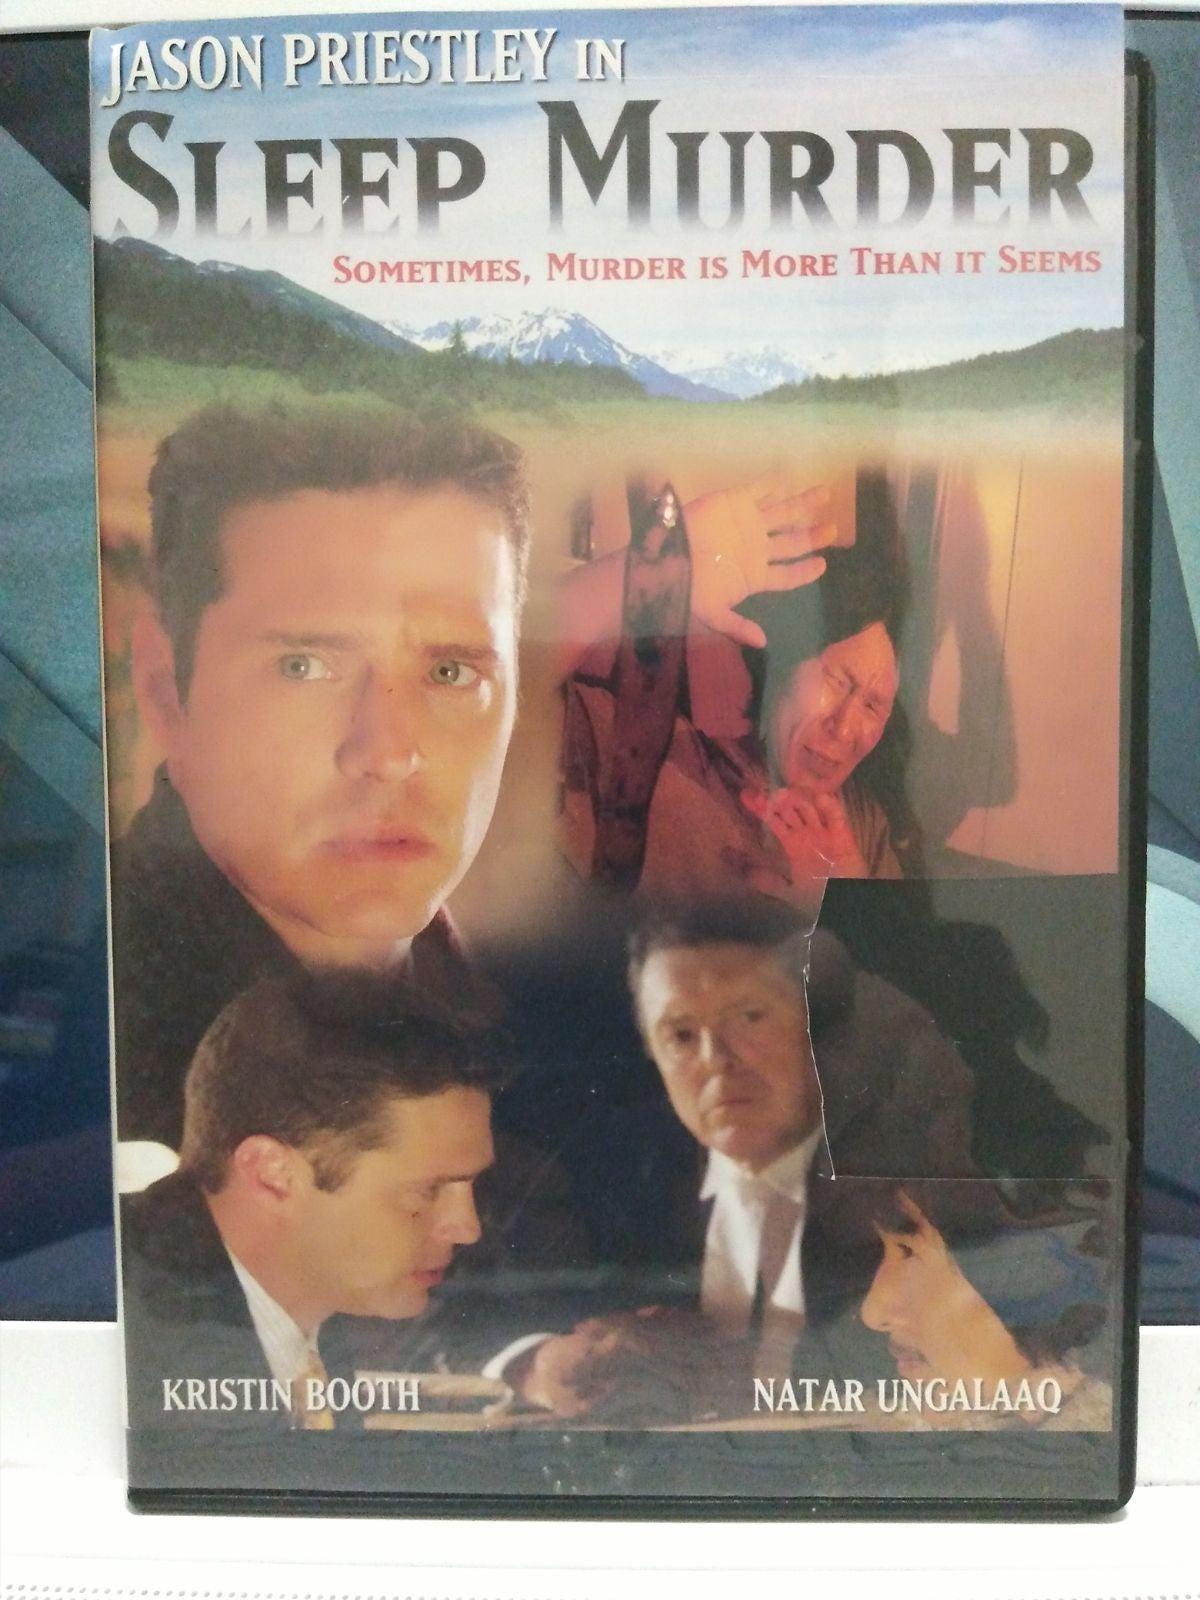 DVD Sleep Murder by Jason Priestley